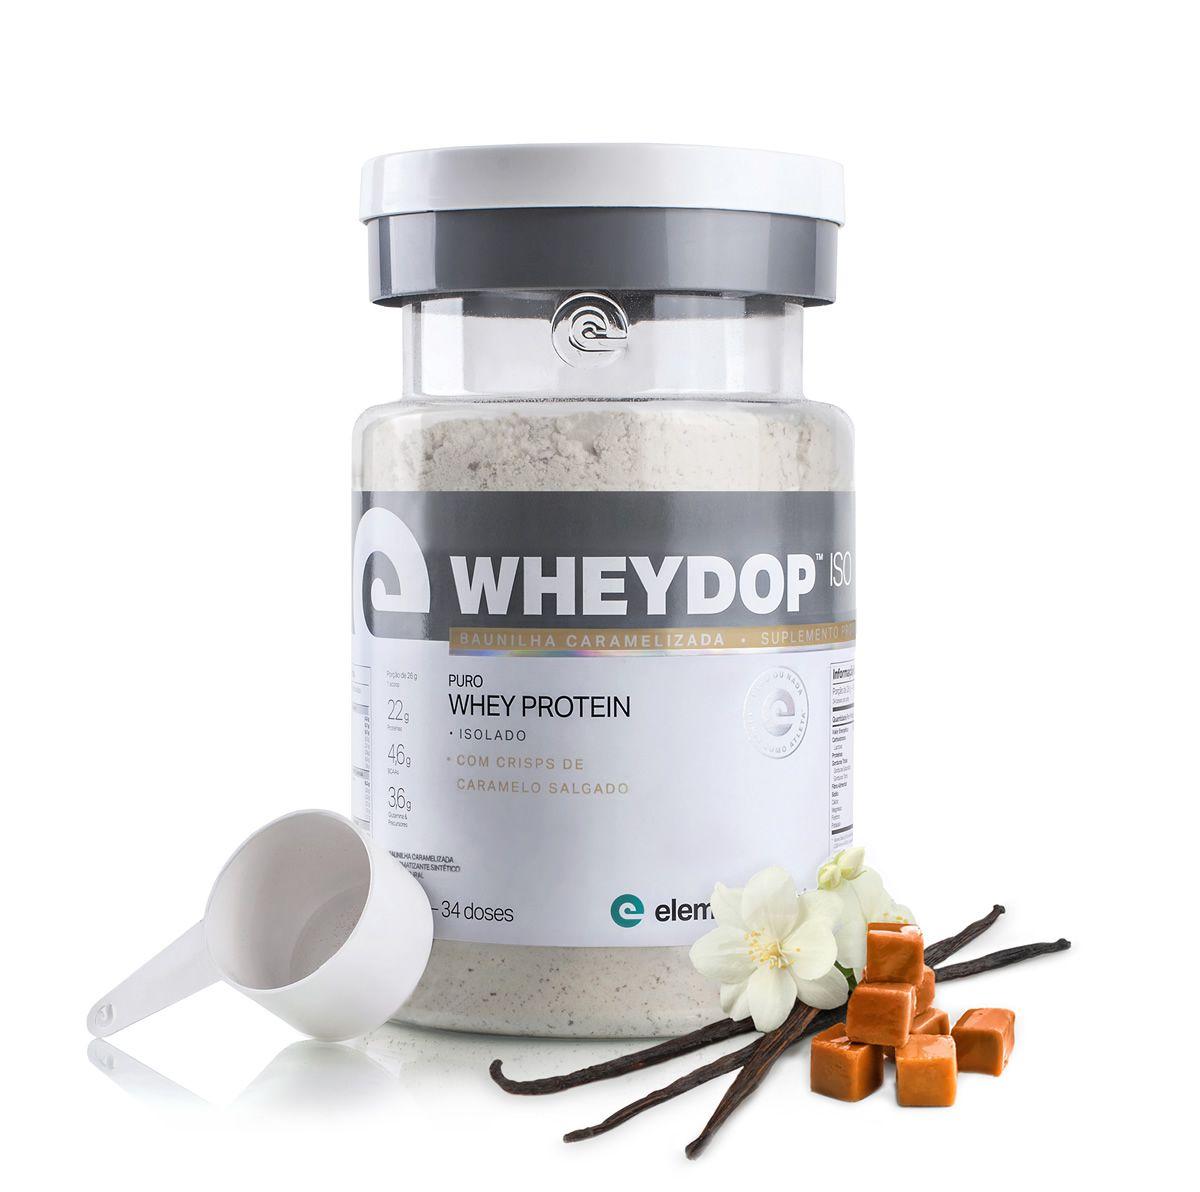 Wheydop Iso 900g Elemento Puro - Baunilha Caramelizada